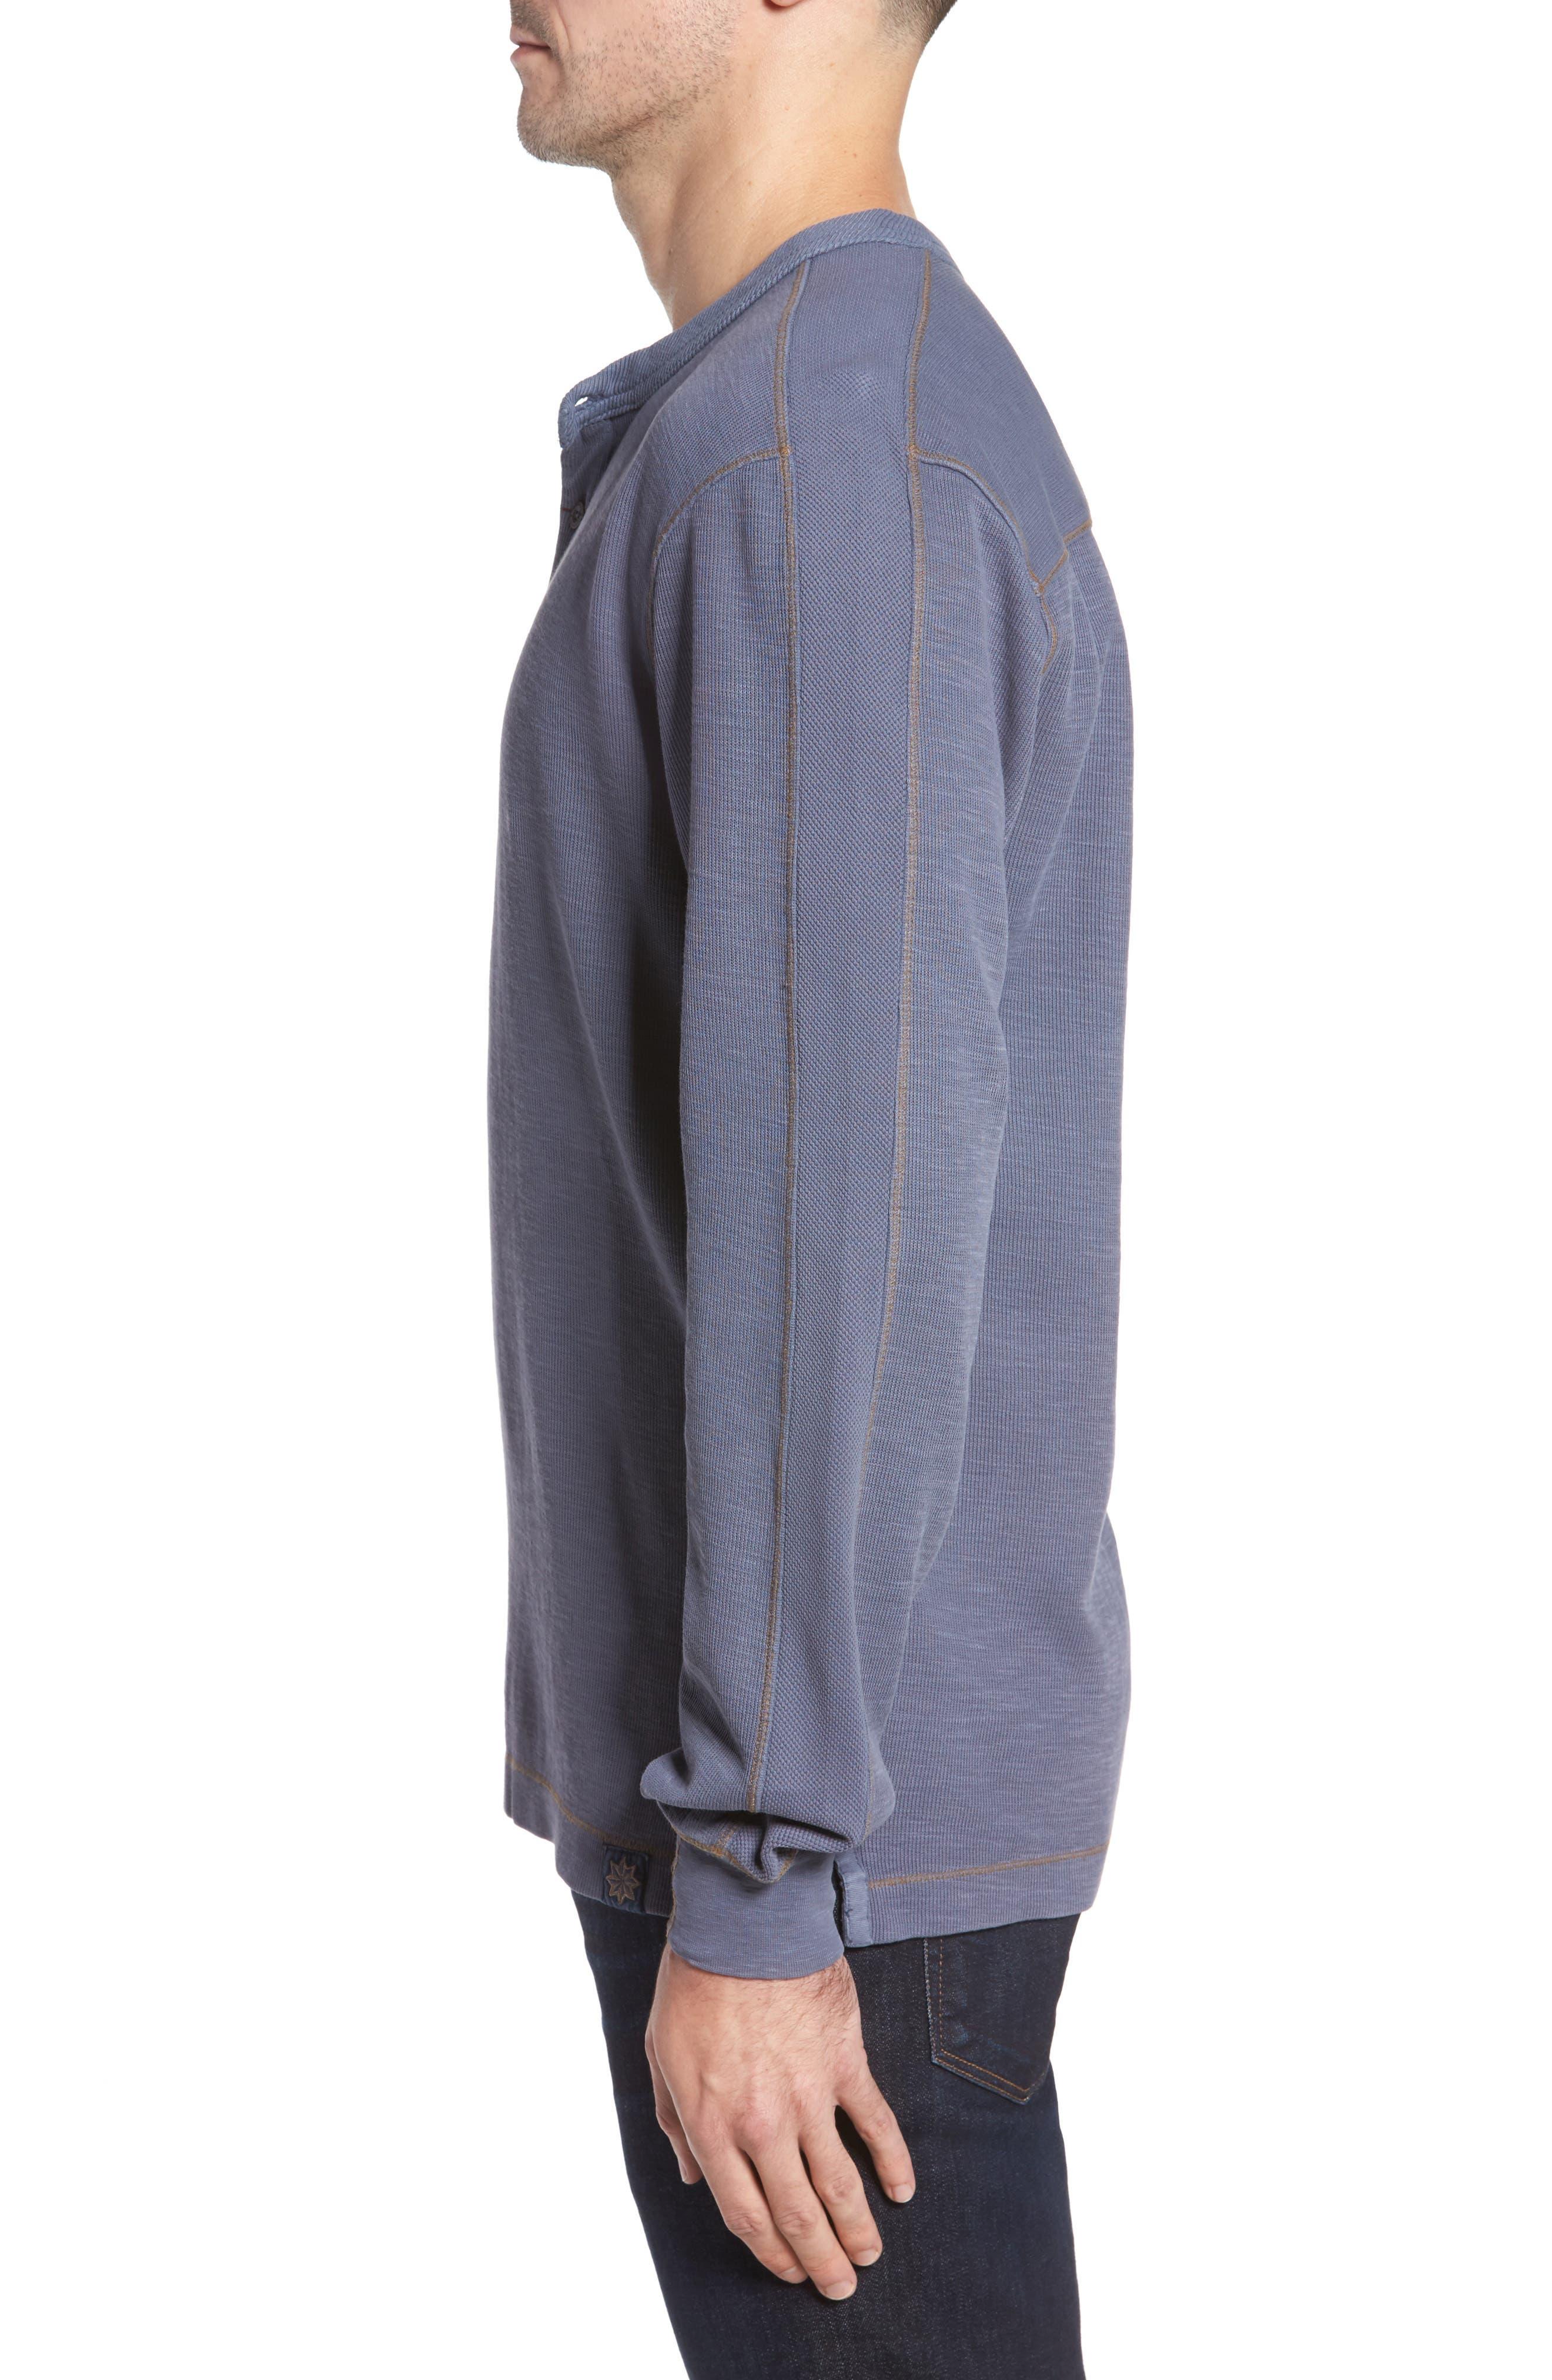 Hans Long Sleeve Henley T-Shirt,                             Alternate thumbnail 3, color,                             014